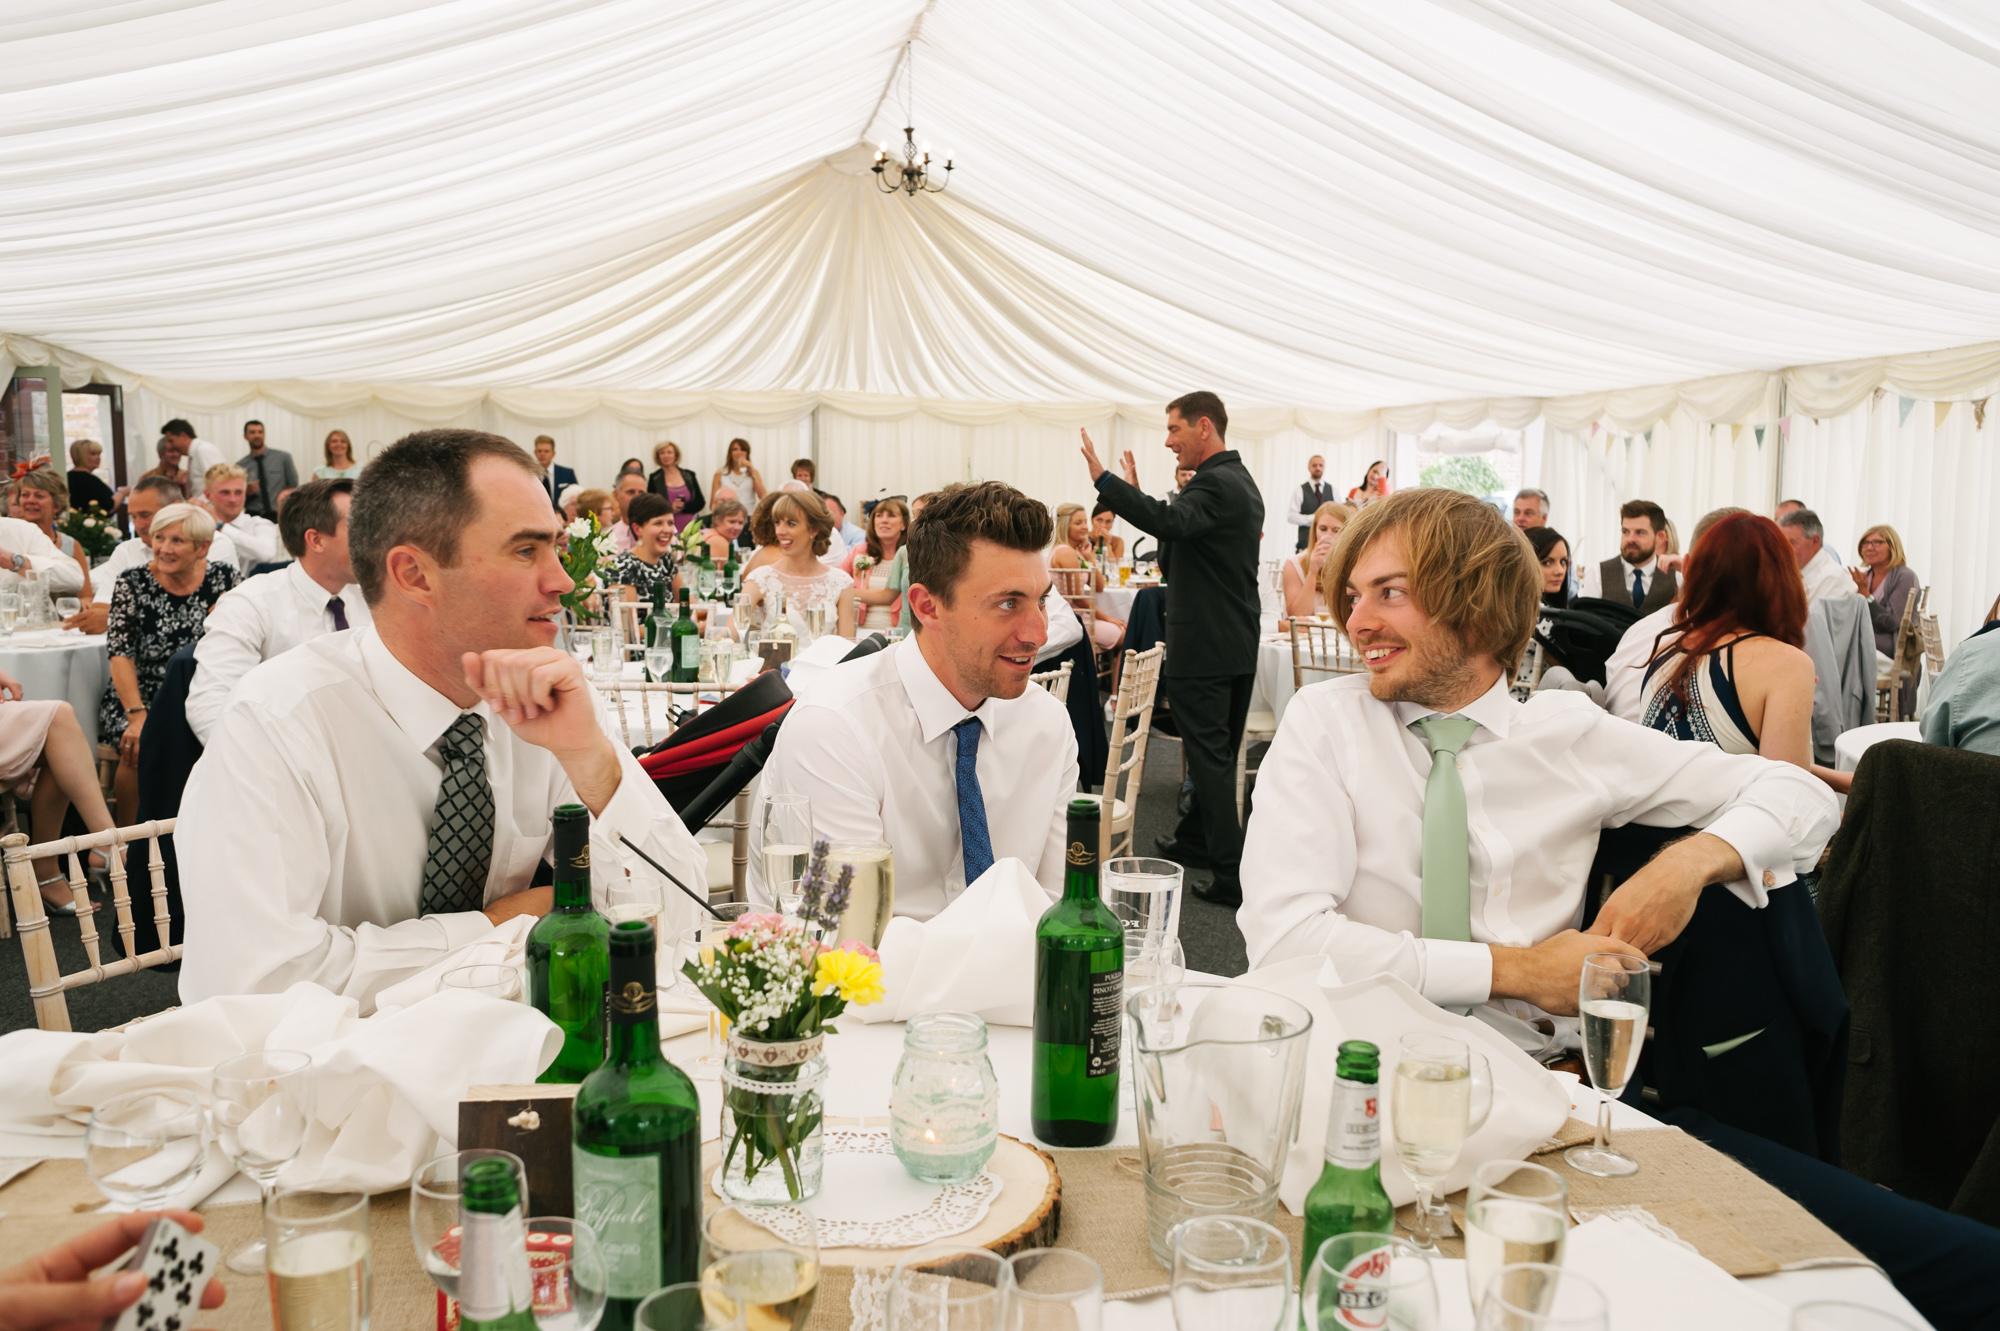 Cricket Club Wedding Tea Party Eversholt Bedfordshire-52